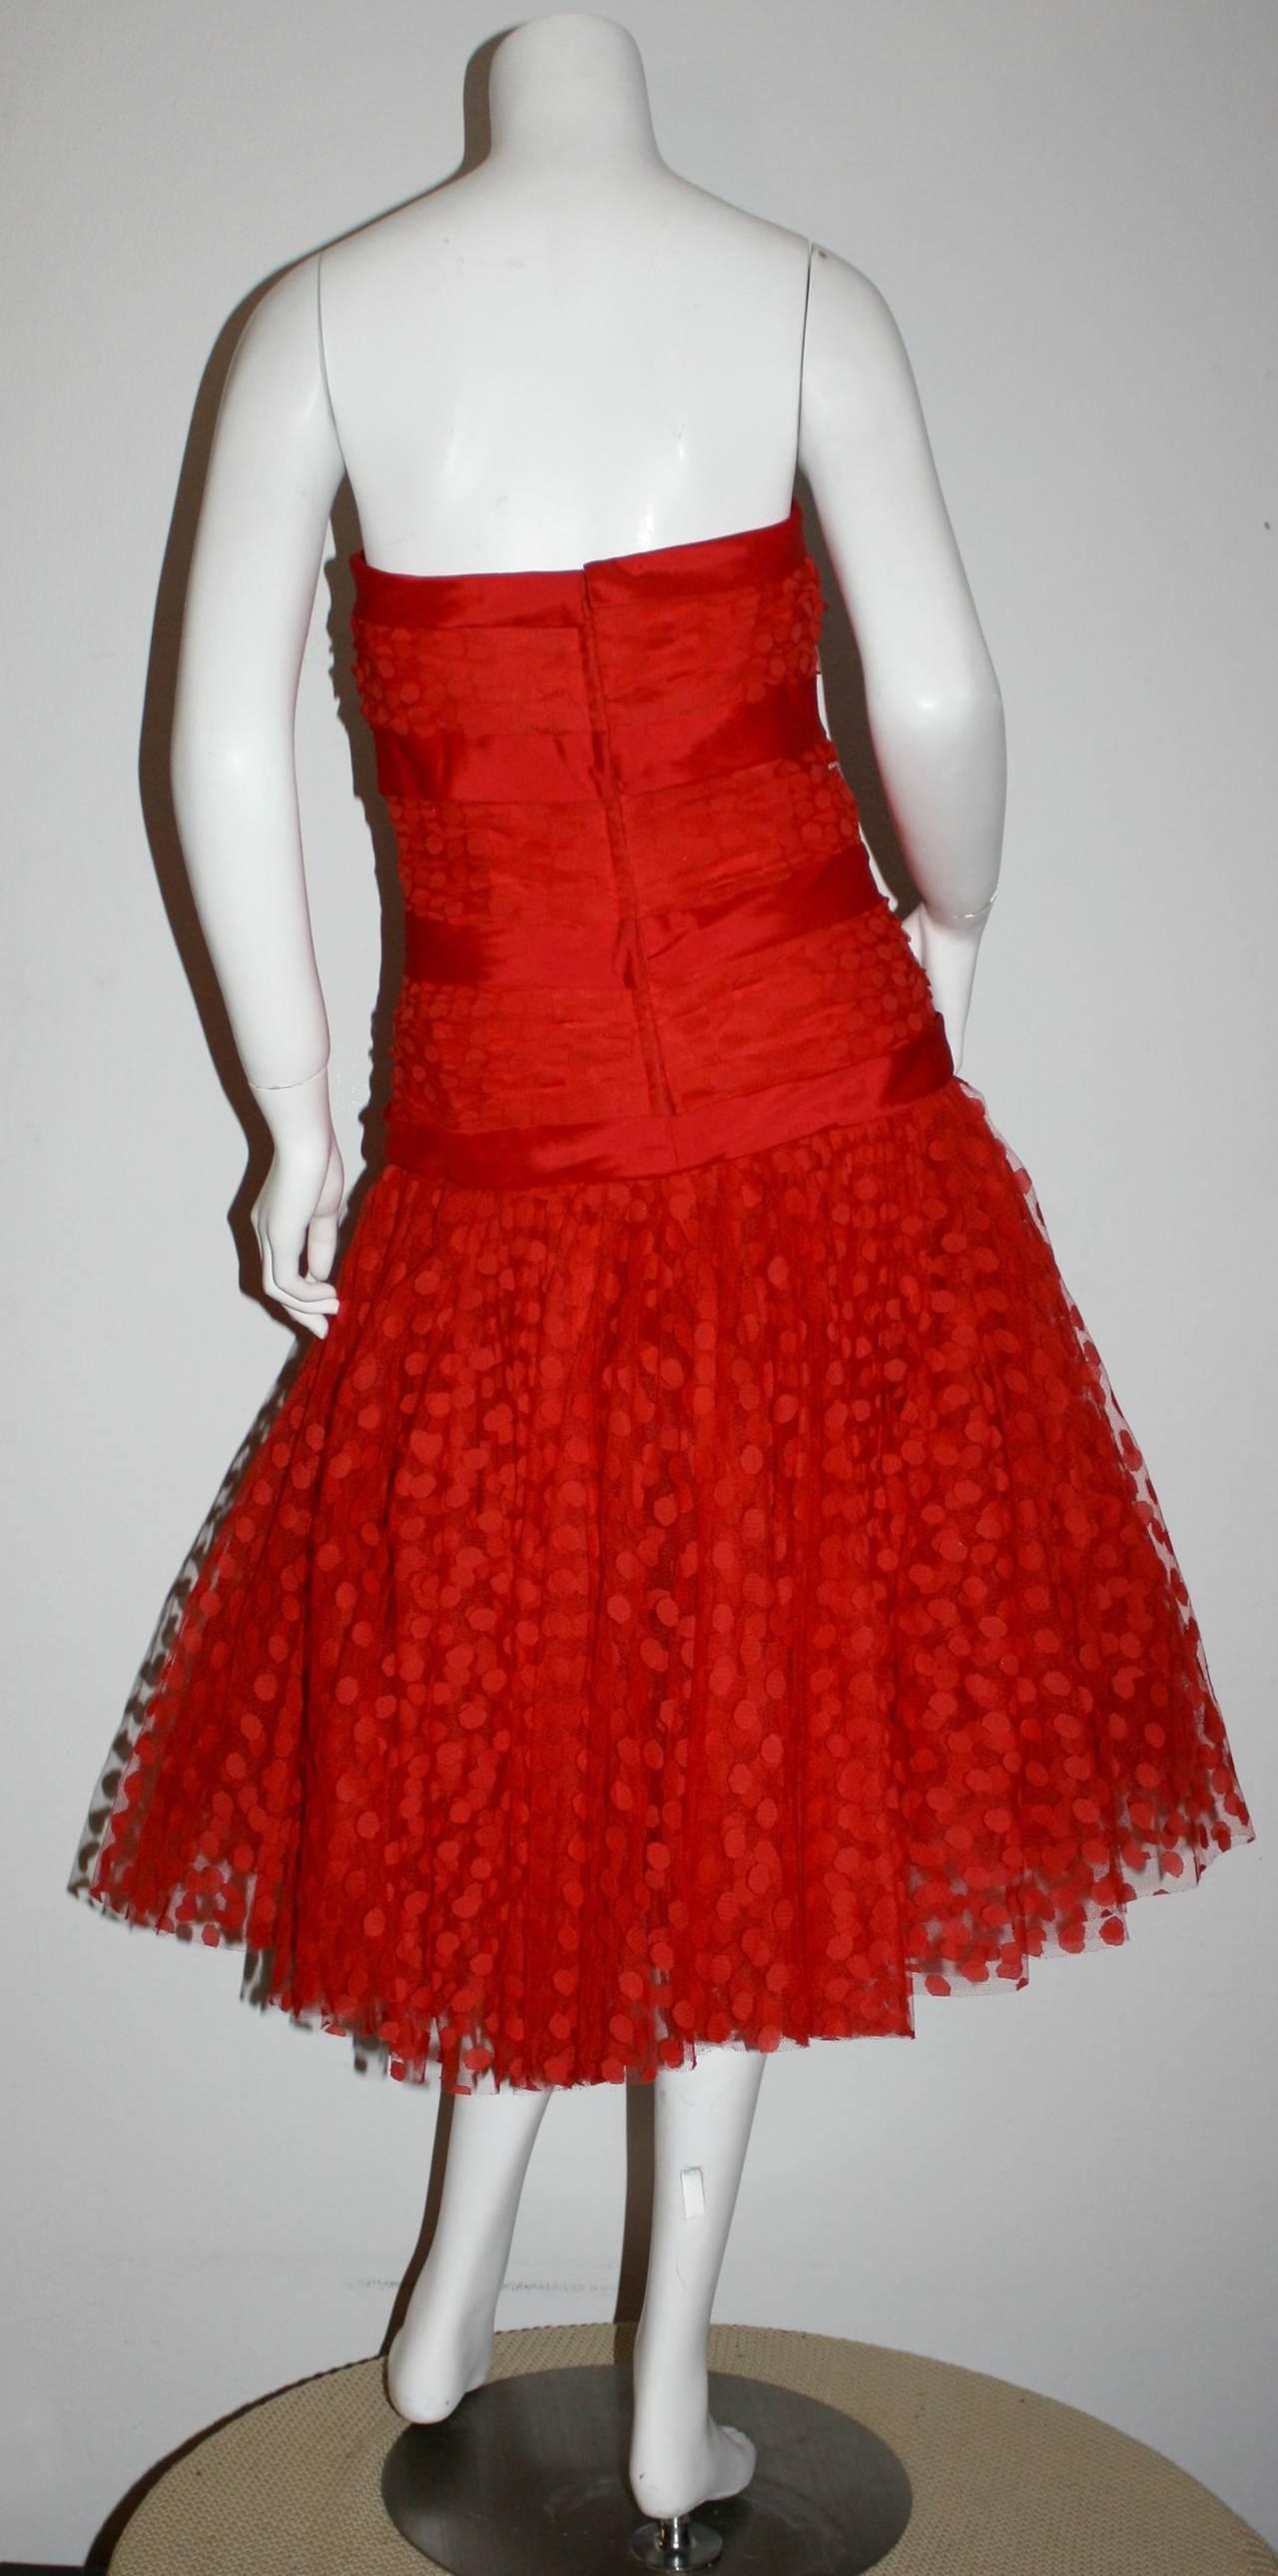 Incredible Vintage Jill Richards for Elizabeth Arden Red Valentine's Day Dress 7